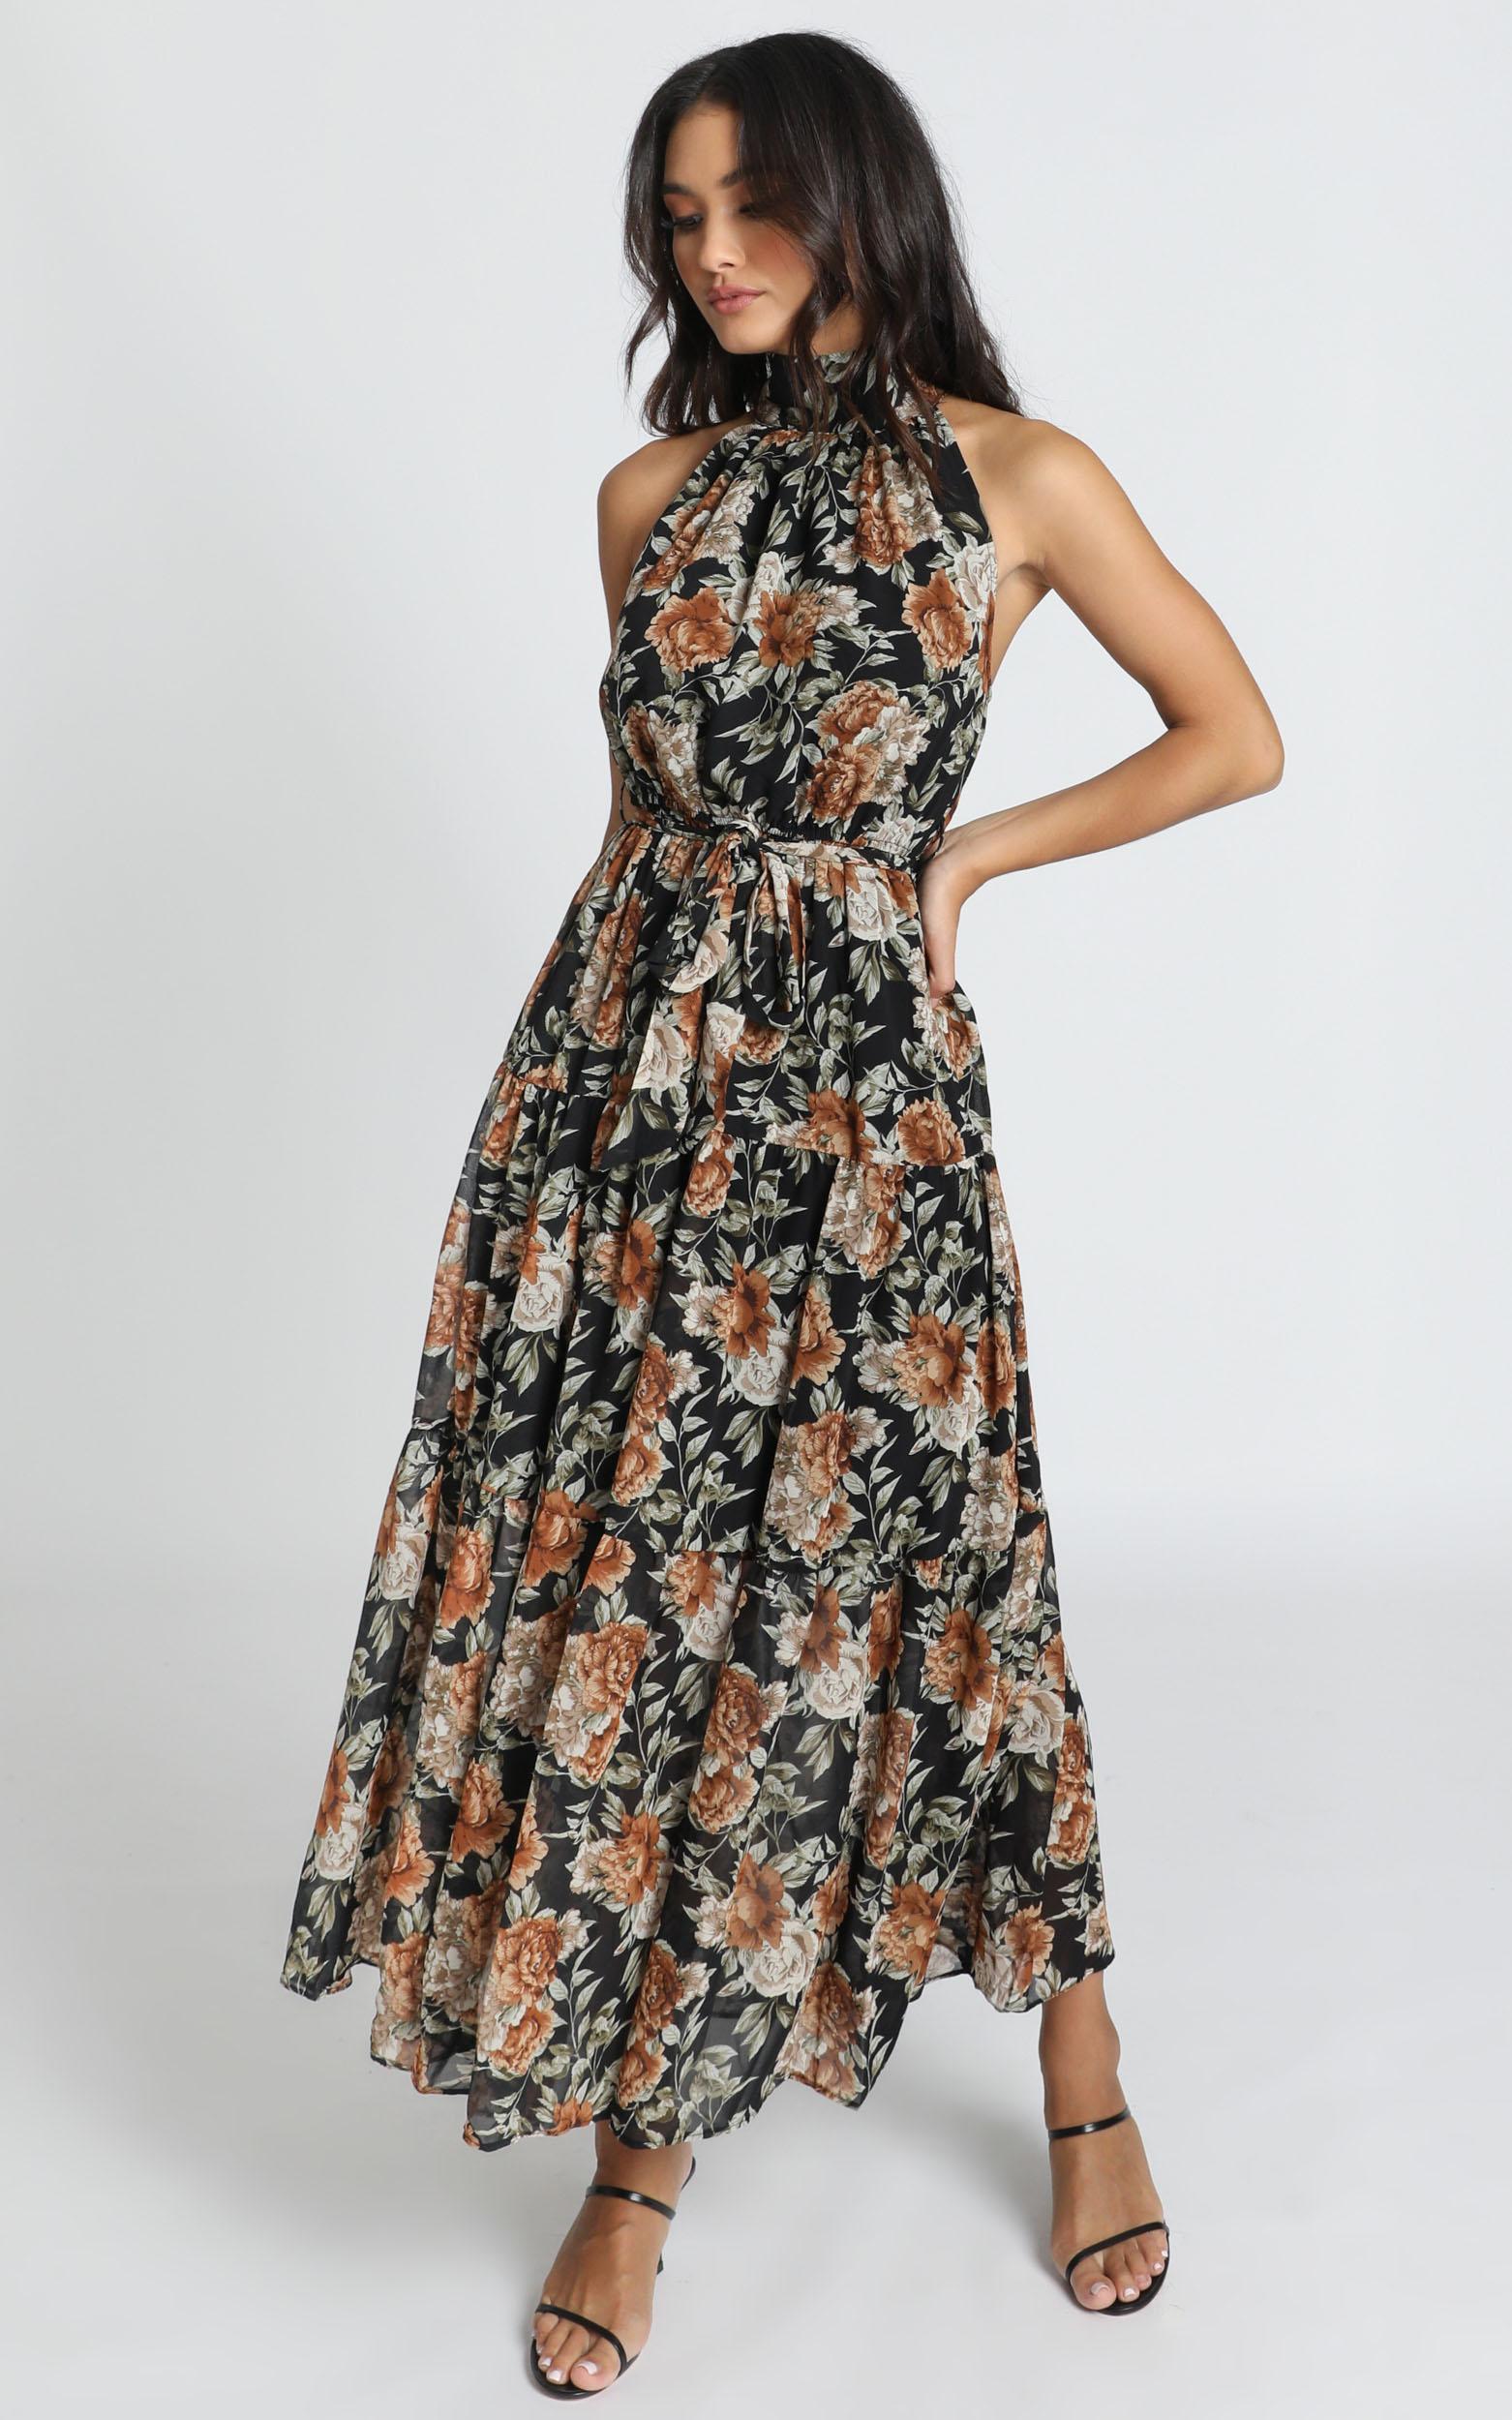 Cooling Power Maxi Dress in black floral - 14 (XL), Black, hi-res image number null